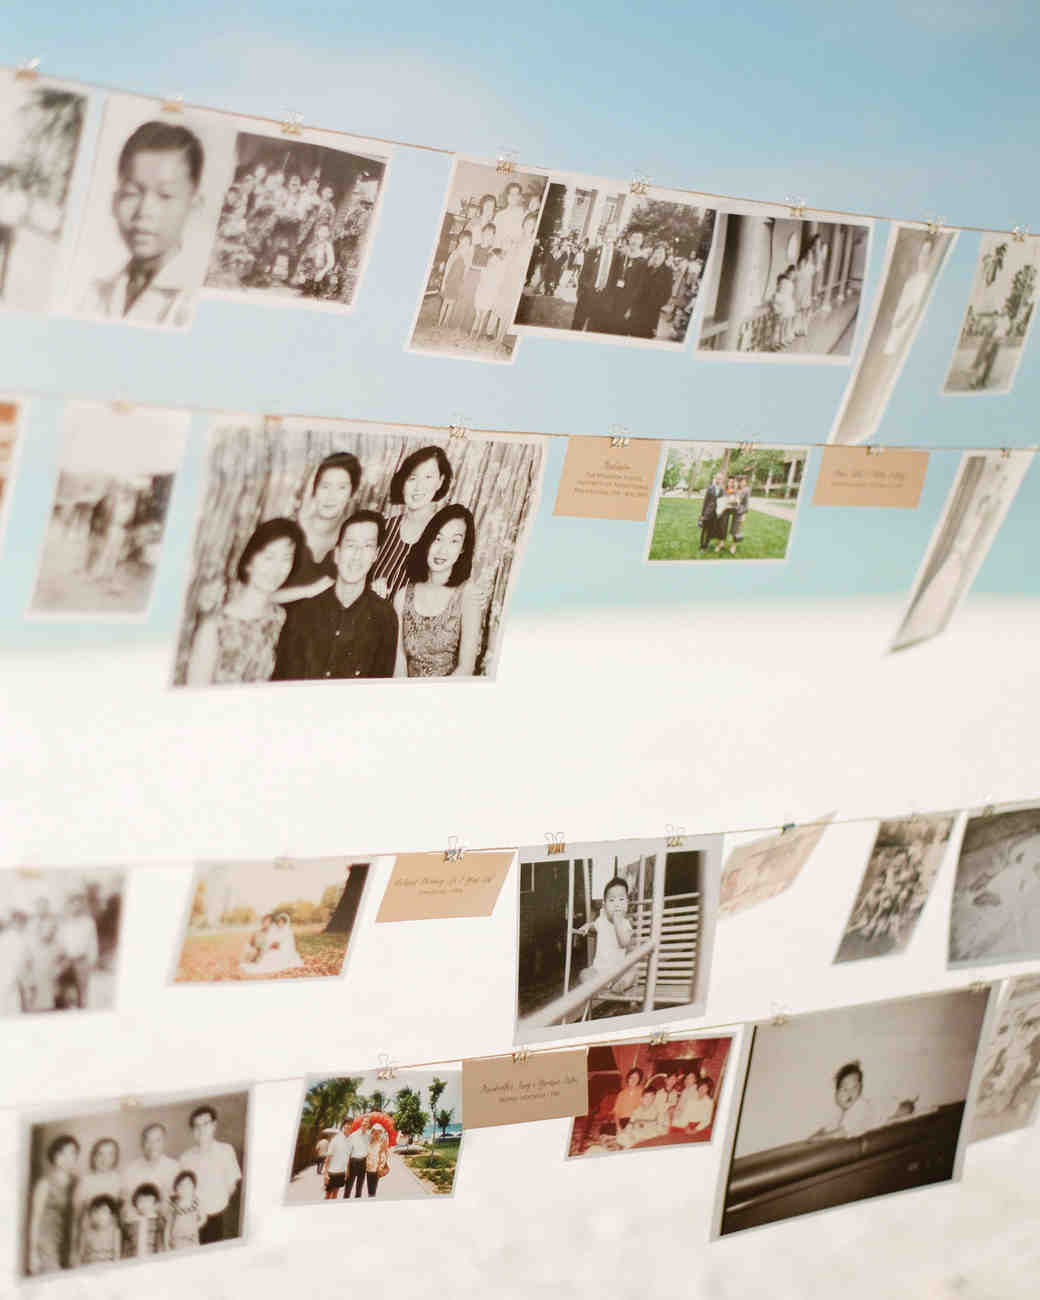 peony-richard-wedding-maldives-hanging-family-photos-1884-s112383.jpg